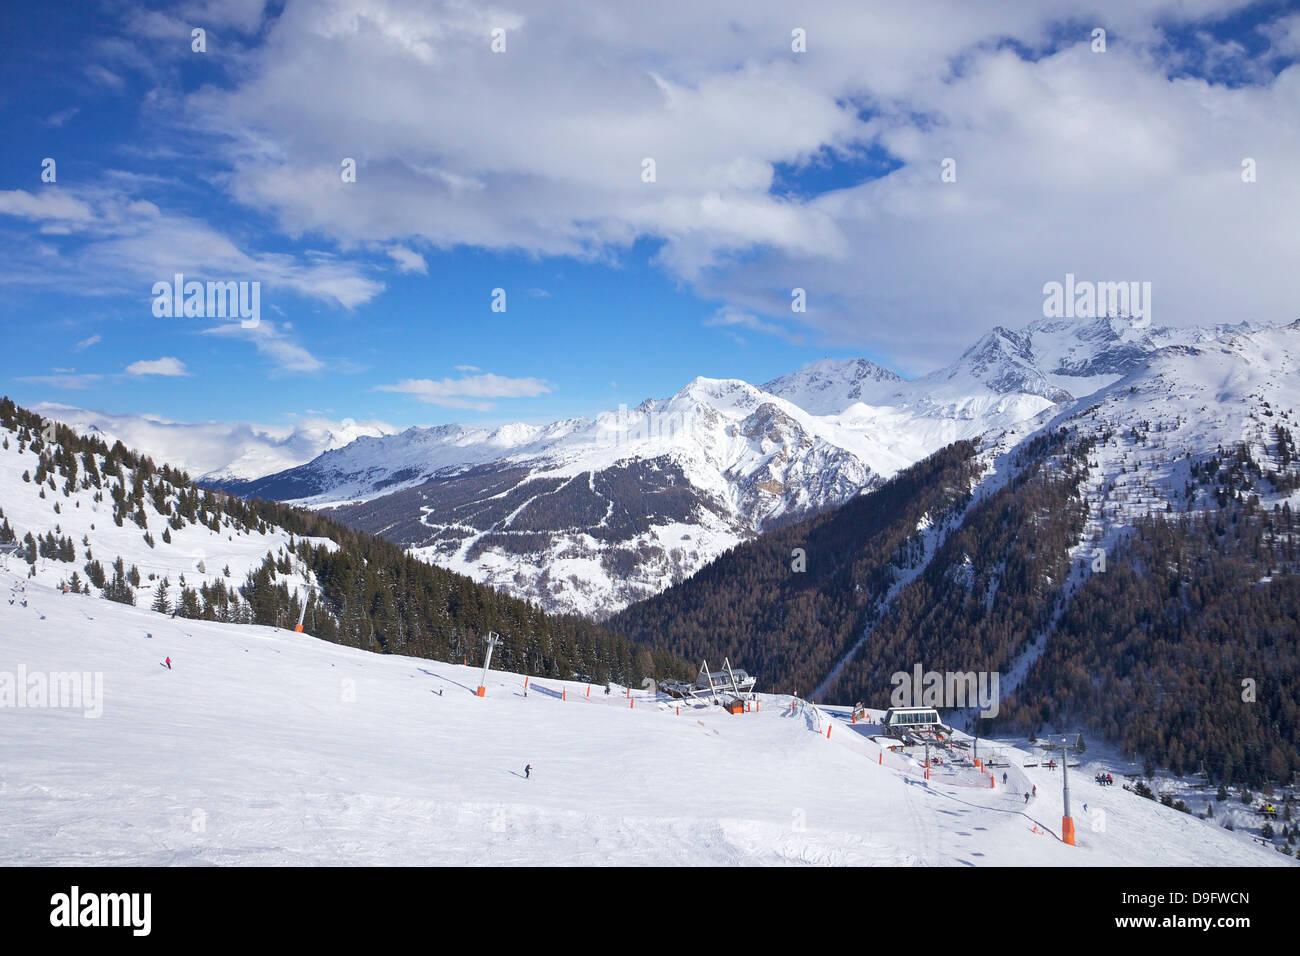 View of Crozats, La Plagne, Savoie, French Alps, France - Stock Image